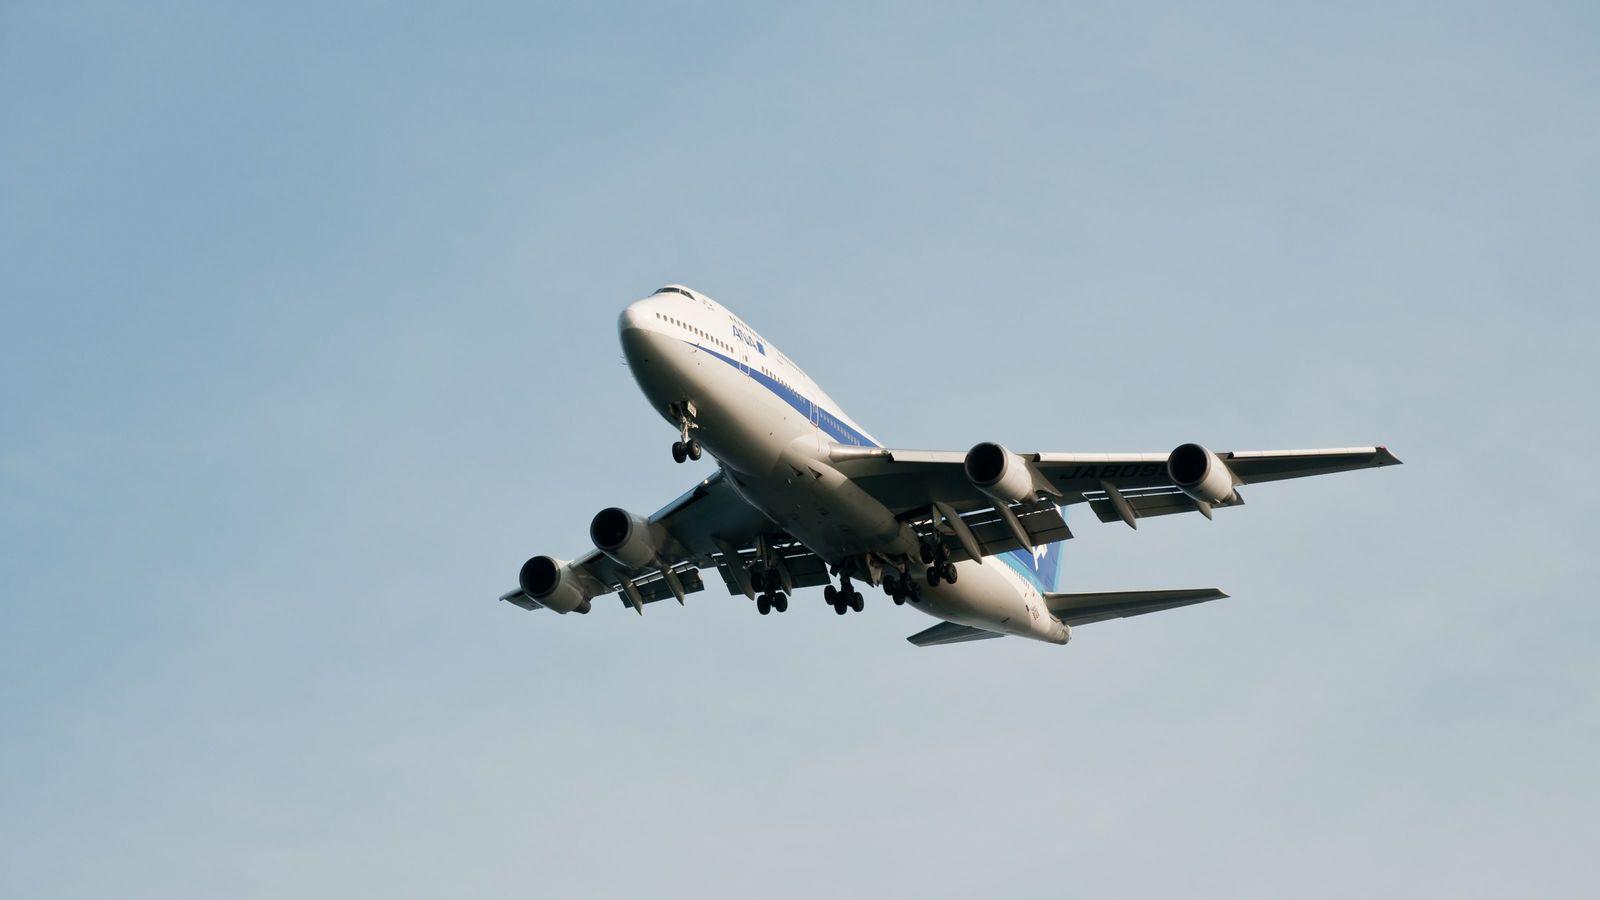 「ANA上級会員」に2日でなれる方法はあるけれど… 超お得な羽田-那覇便はほぼ満席